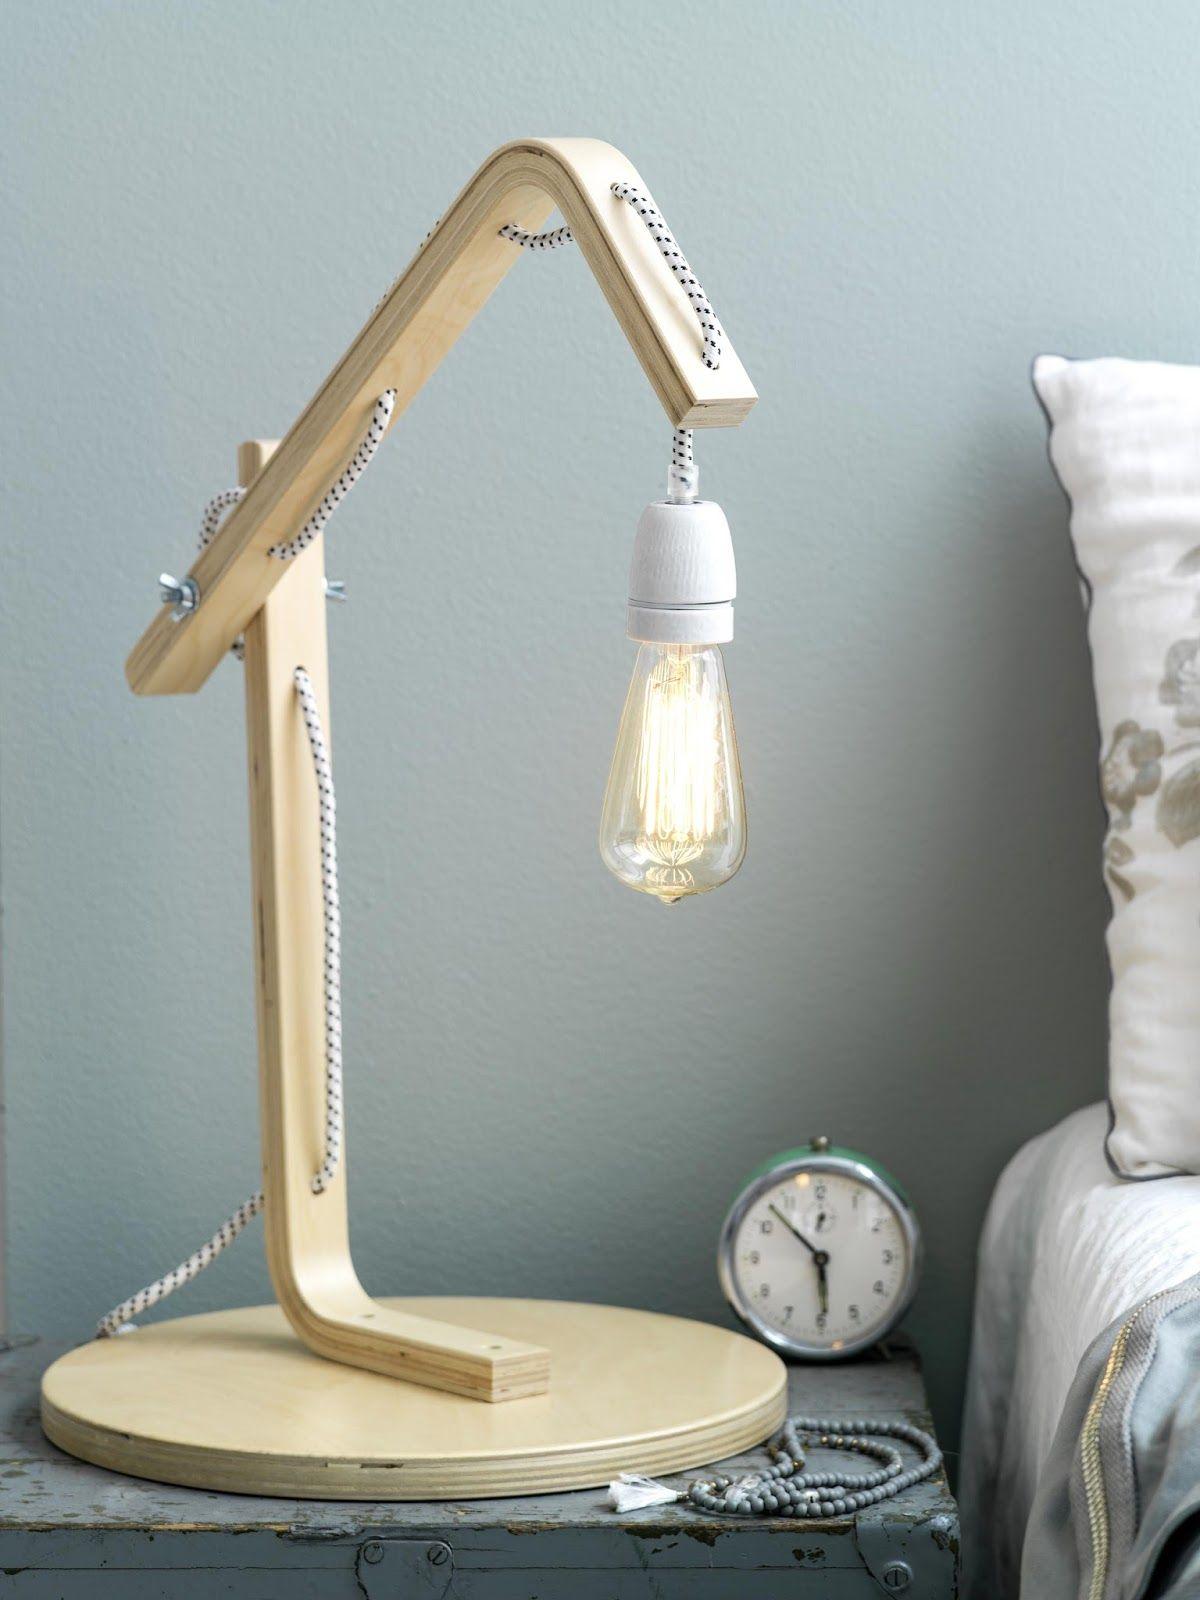 5 Id Es Pour Customiser Le Tabouret Frosta D Ikea D Coration  # Customizer Meuble Ikea